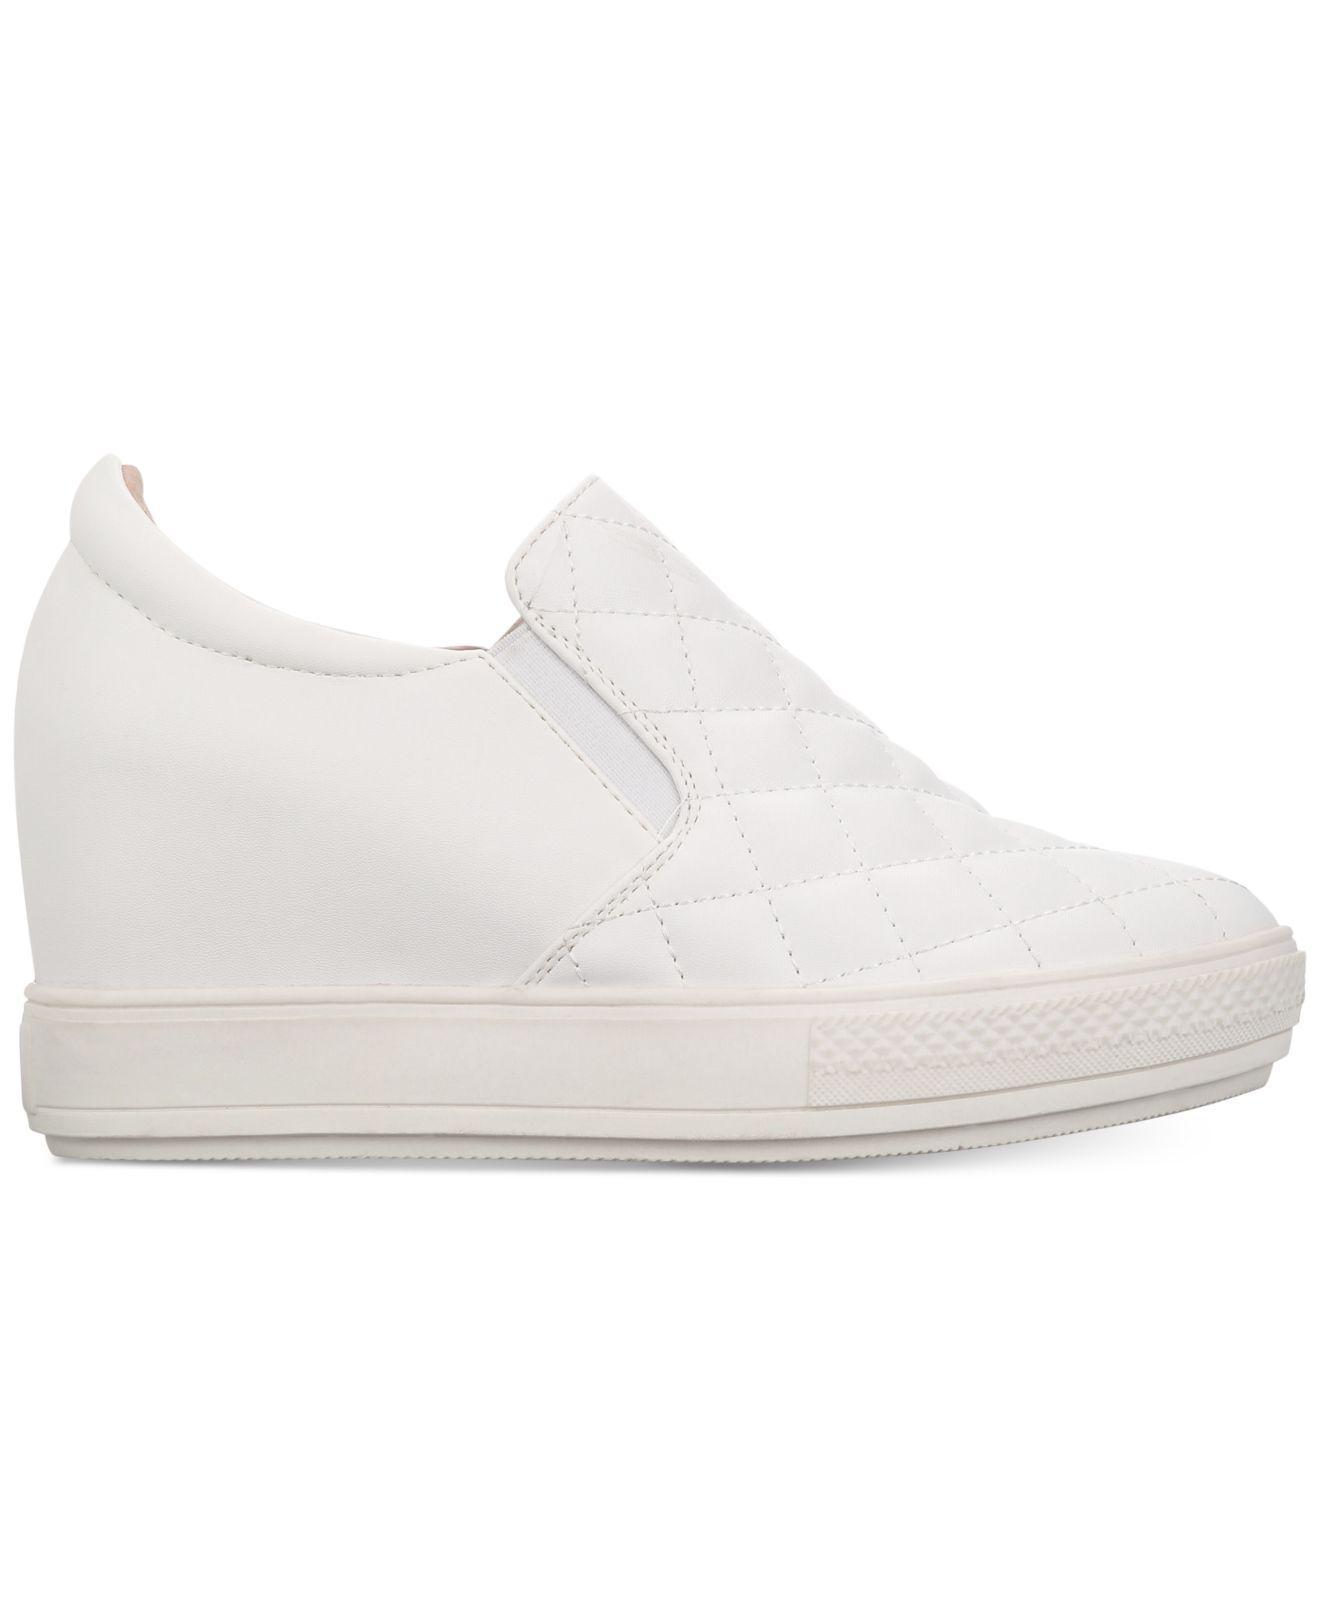 Wanted Slip On Wedge White Sneakers Bushkill XPZuik